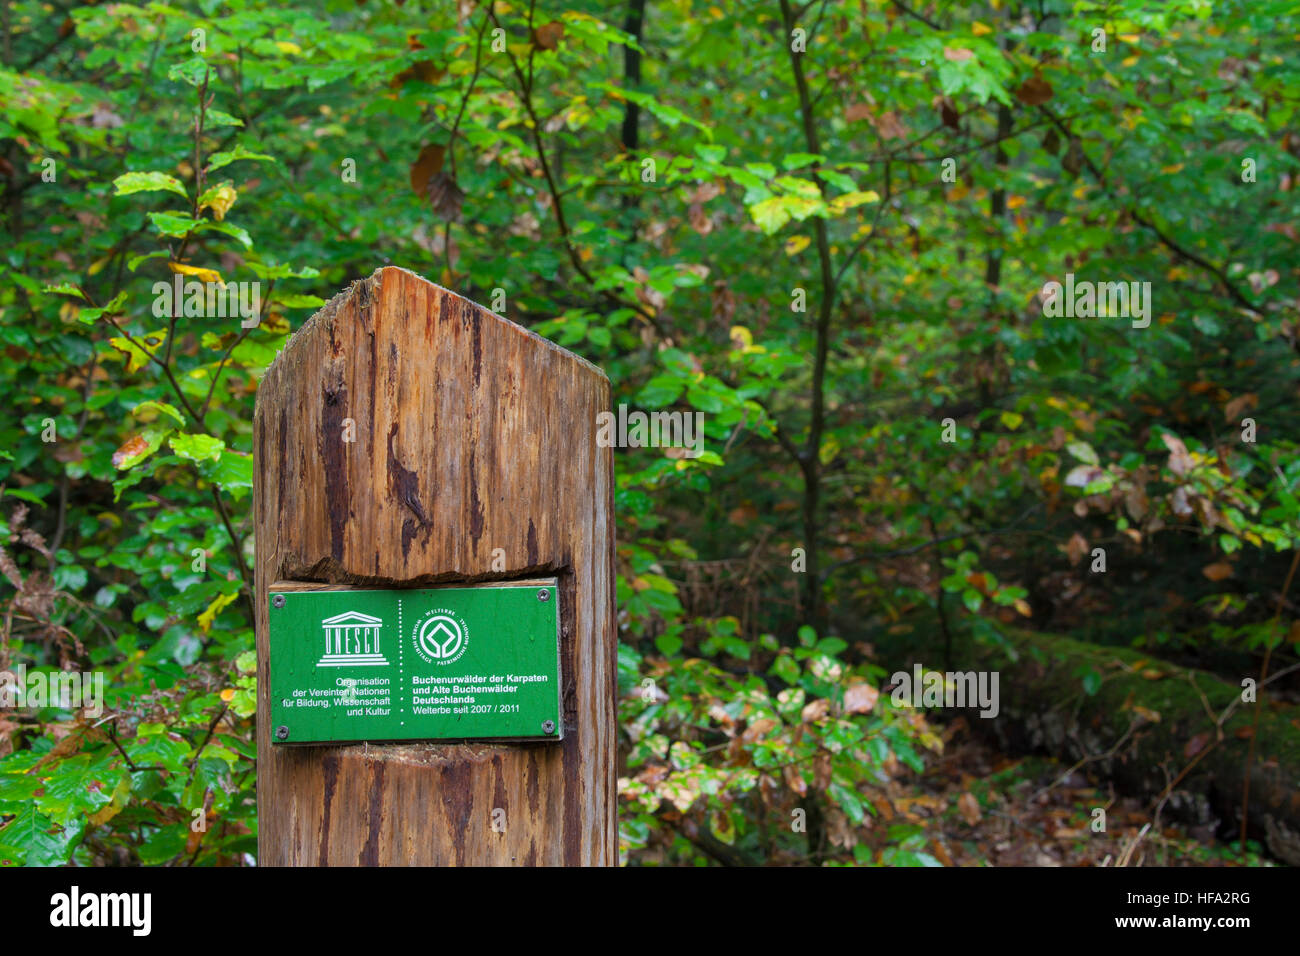 Unesco sign in the Müritz National Park / Müritz Nationalpark, Mecklenburg-Western Pomerania, Germany - Stock Image